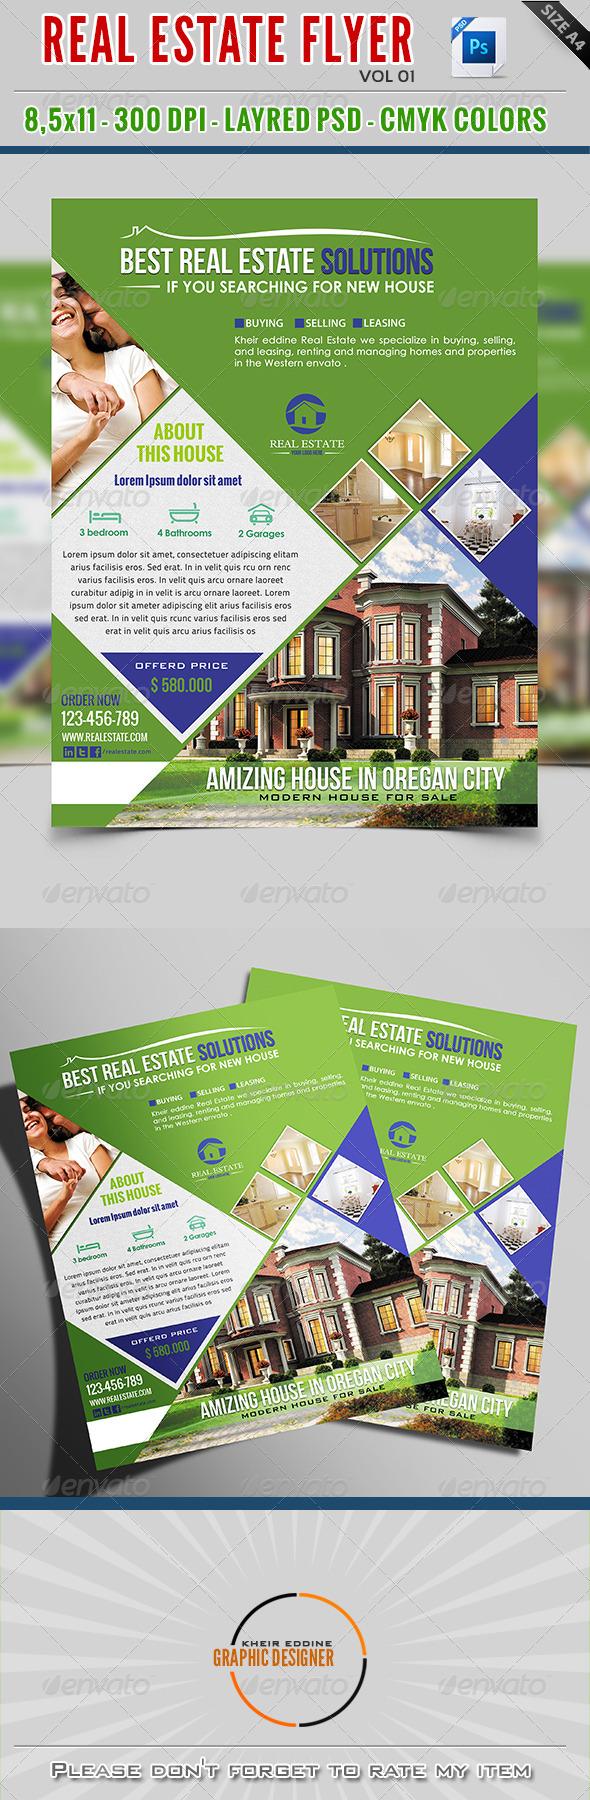 GraphicRiver Real Estate Flyer Vol 01 7949954